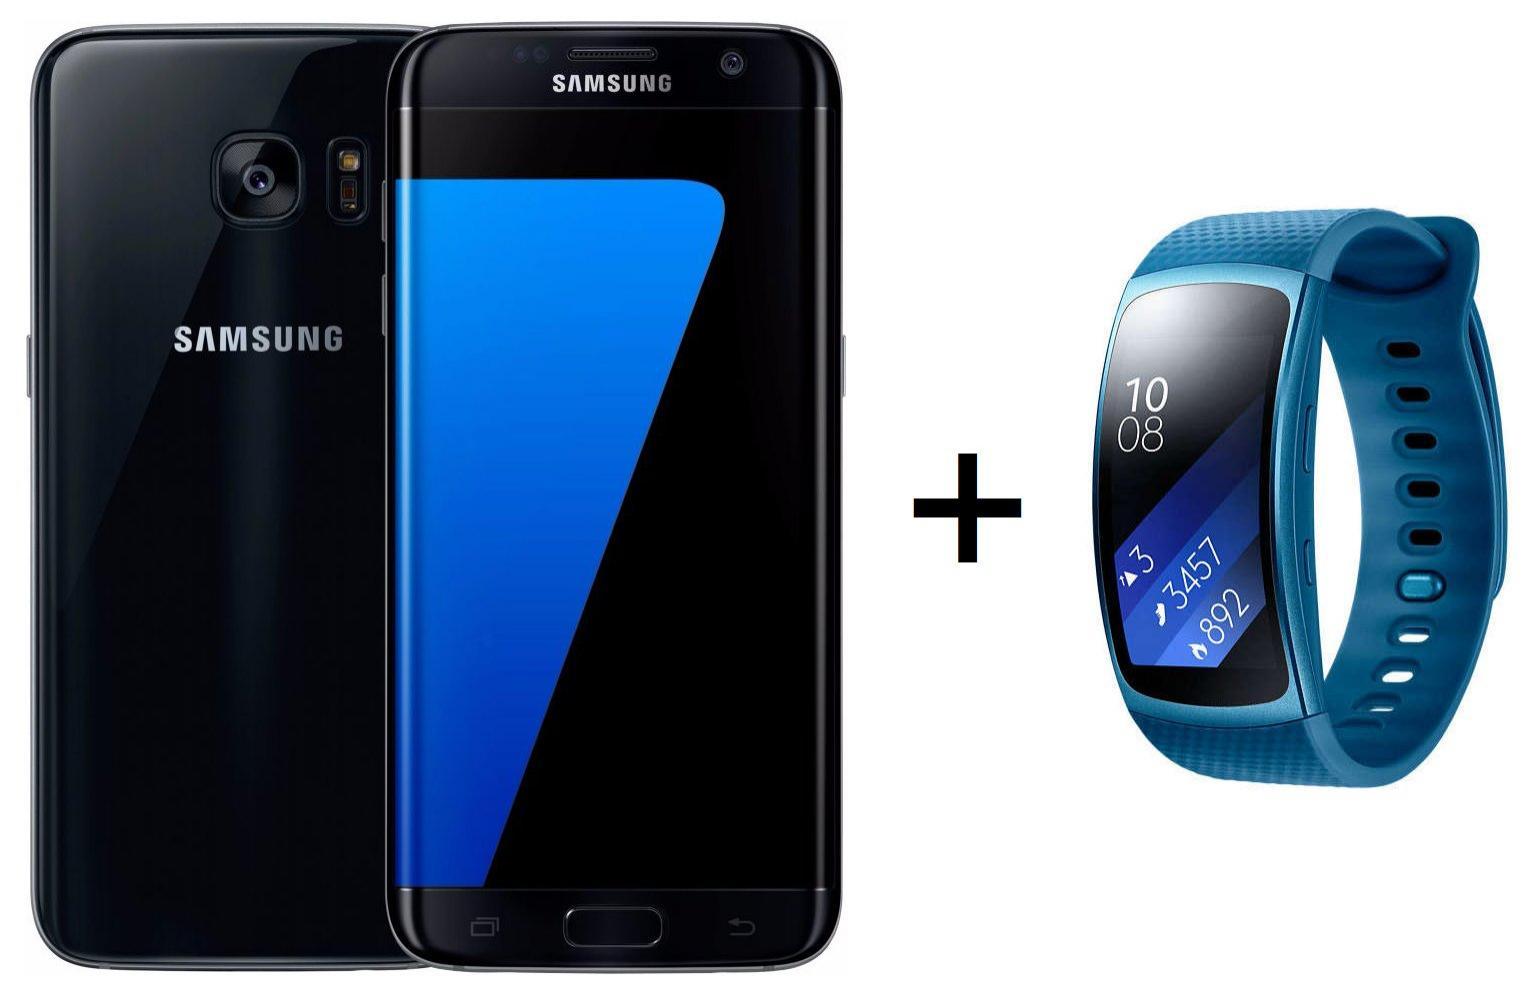 "Smartphone 5.5"" Samsung Galaxy S7 Edge - 32 Go, Noir + Montre connectée Samsung Gear Fit 2 (Bleu, Taille S)"